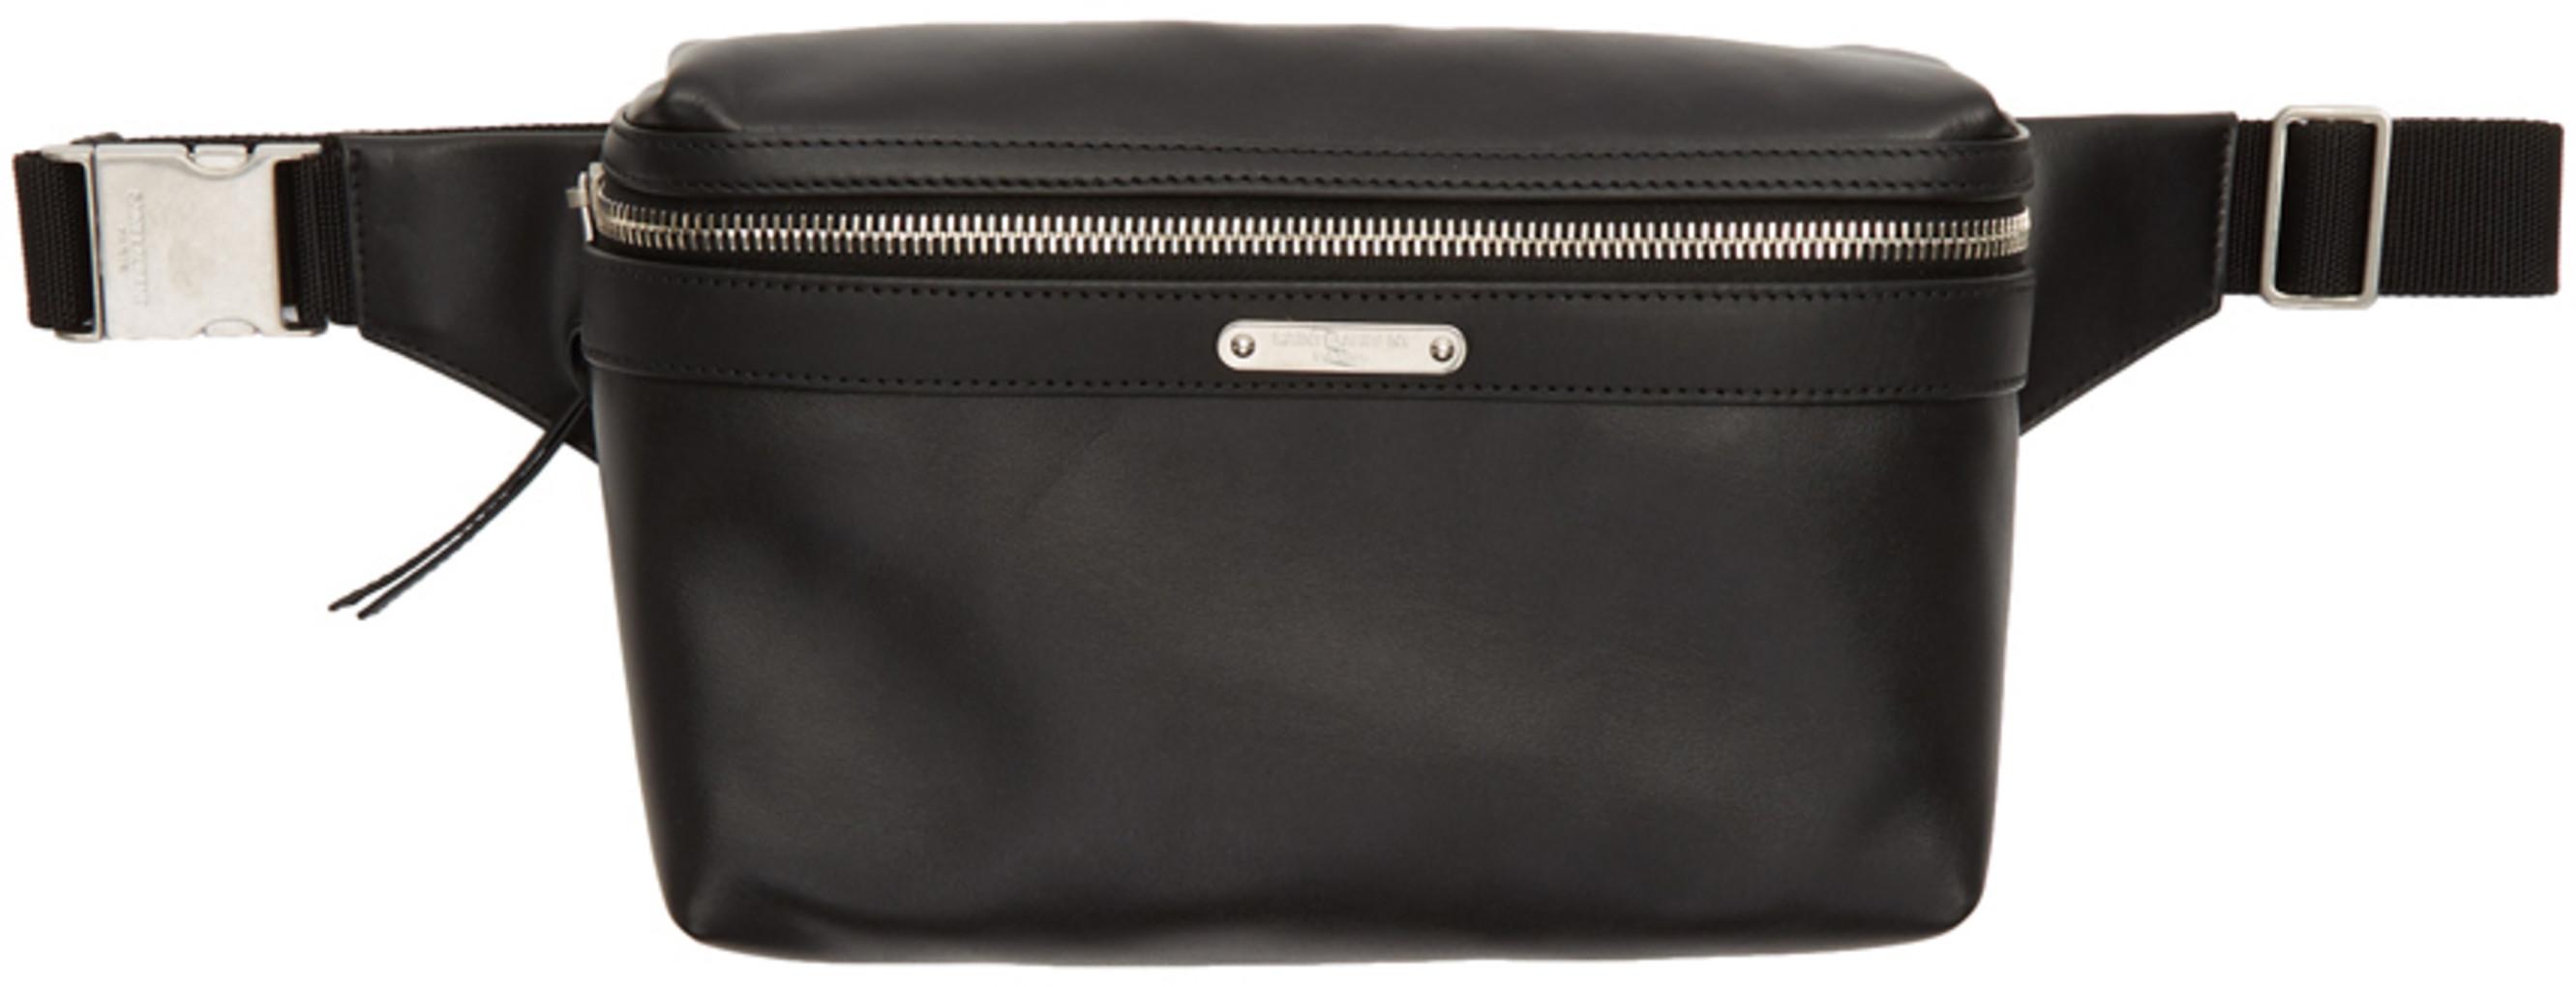 58f66b55317d9a Designer pouches & document holders for Men   SSENSE